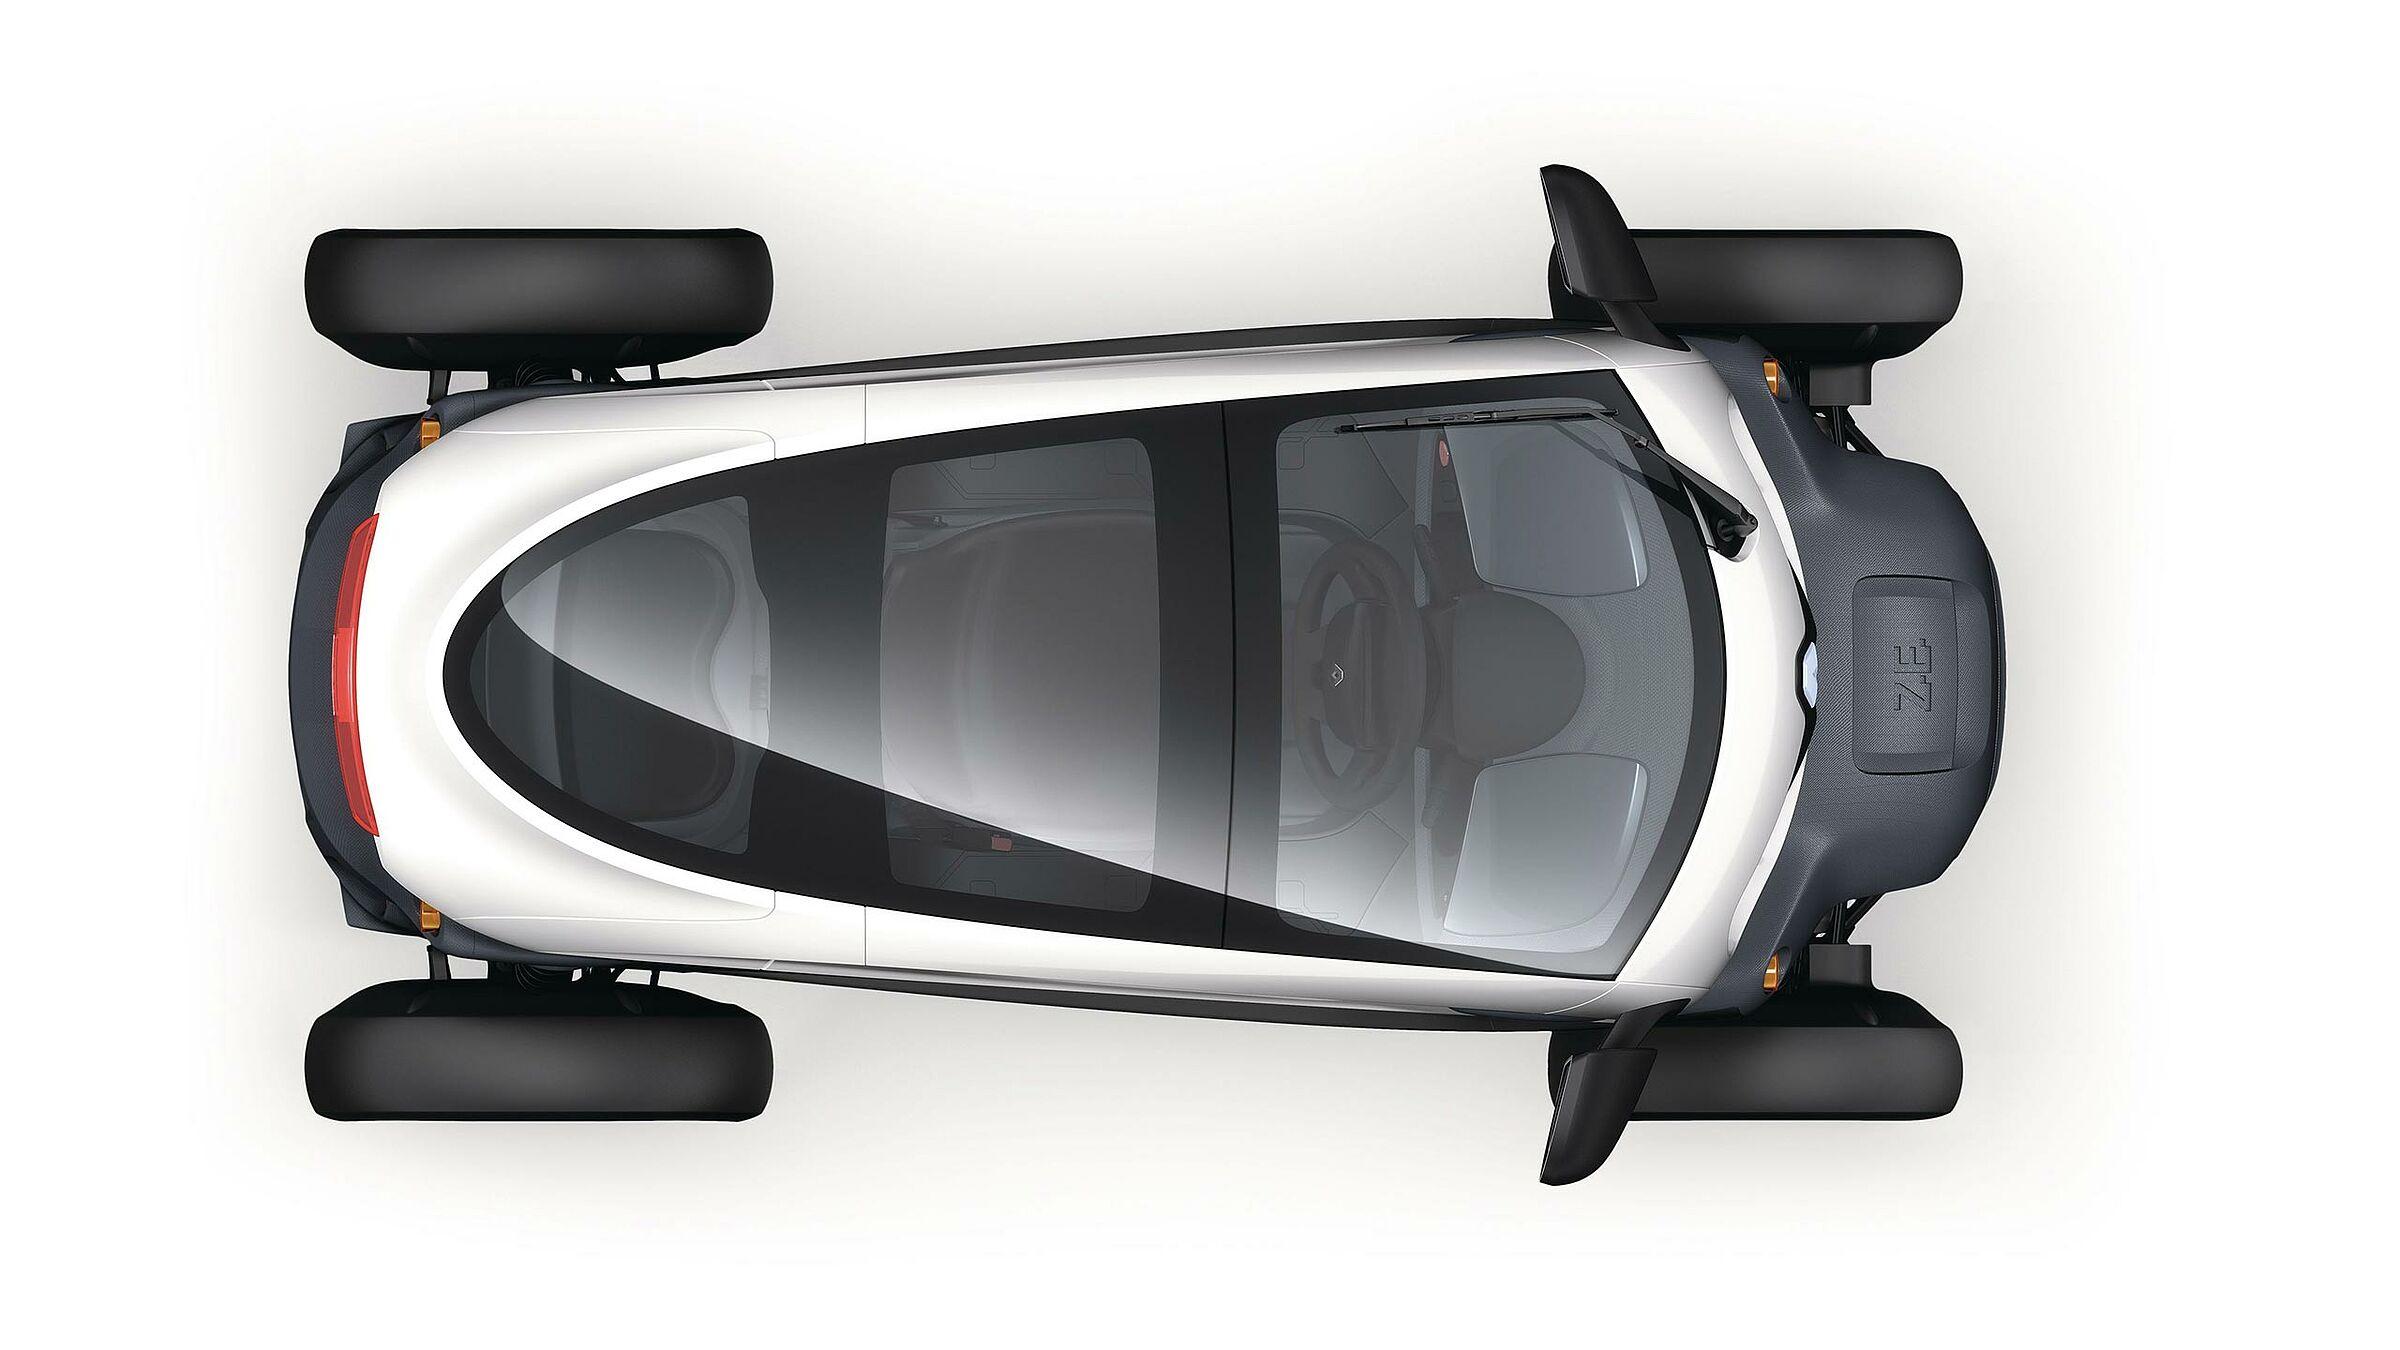 Renault Twizy Autozentren P&A - Preckel